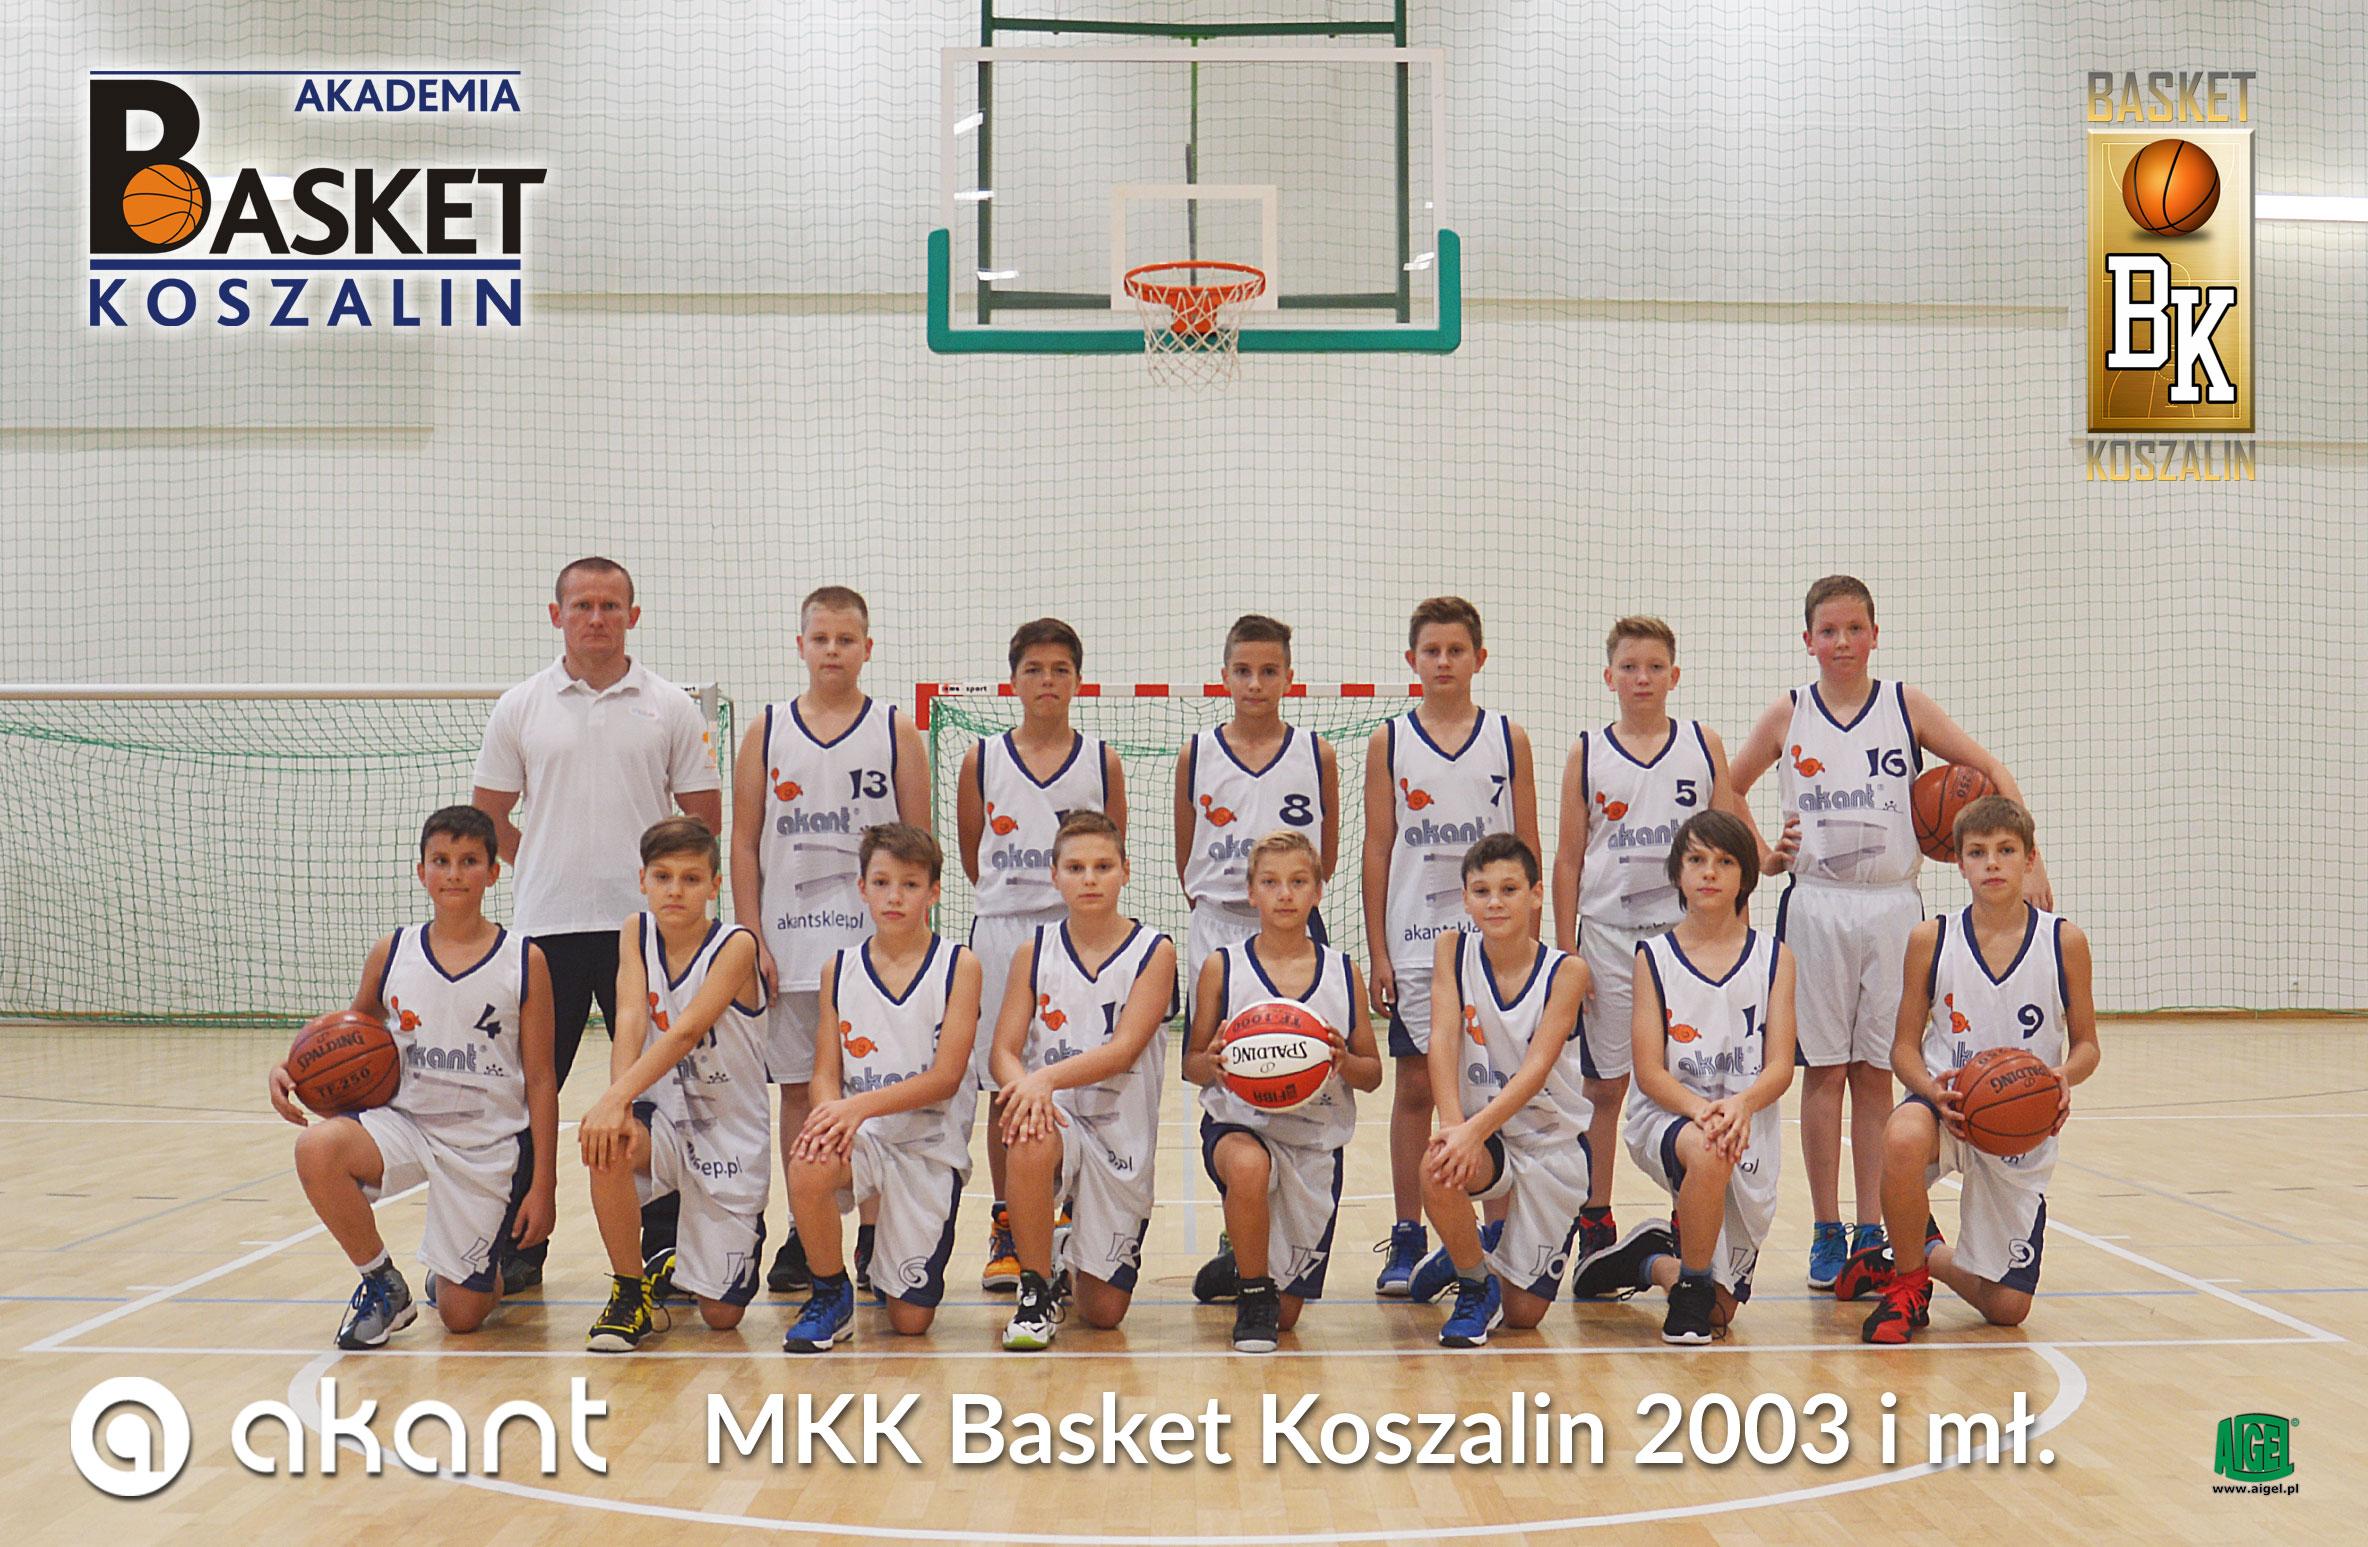 MKK Basket Koszalin 2003